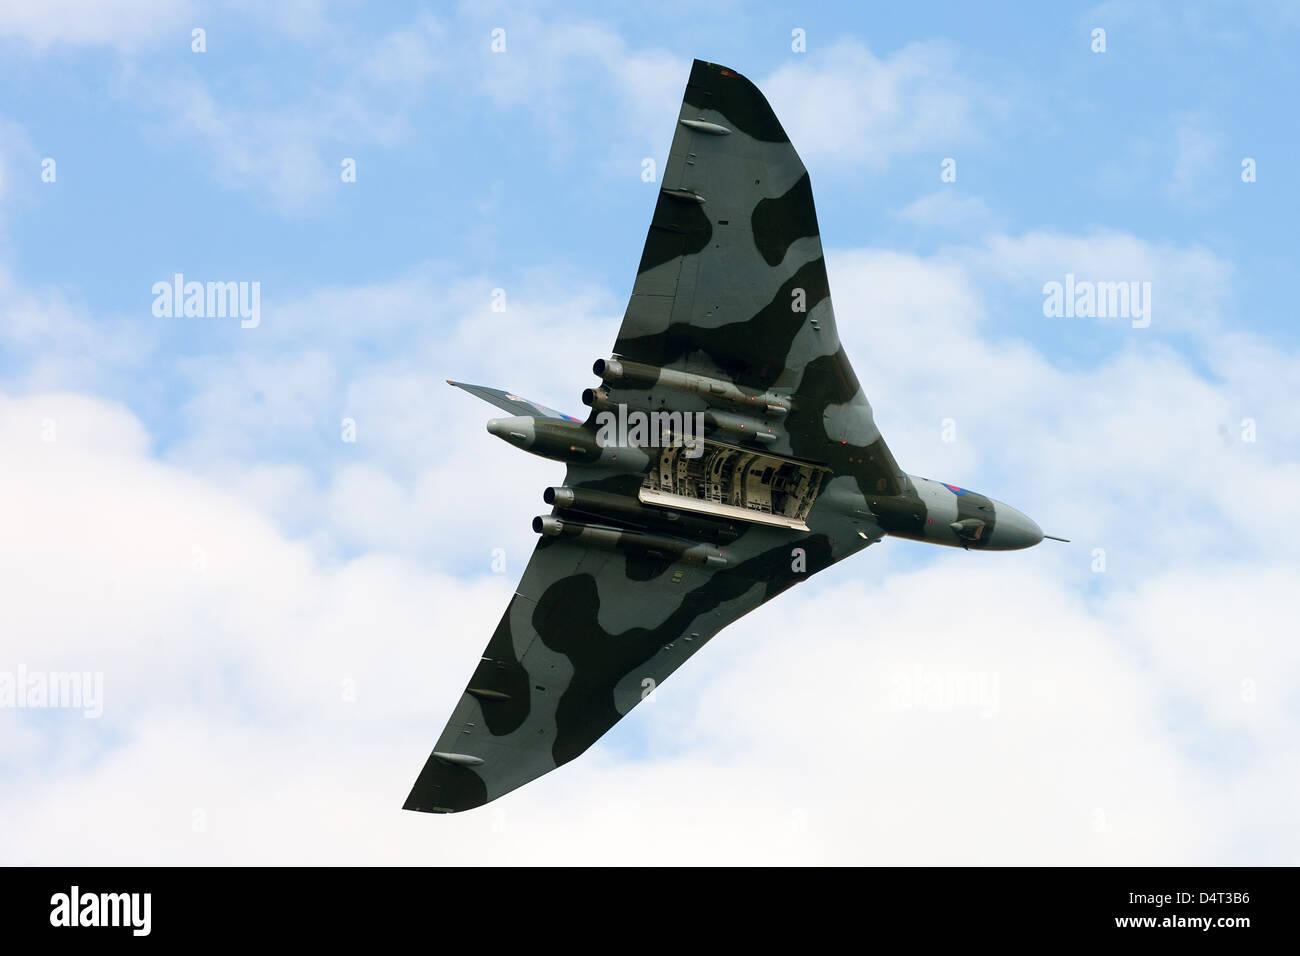 Vulcan Bomber XH558 performing at a display at Sywell Aerodrome, Northamptonshire - Stock Image